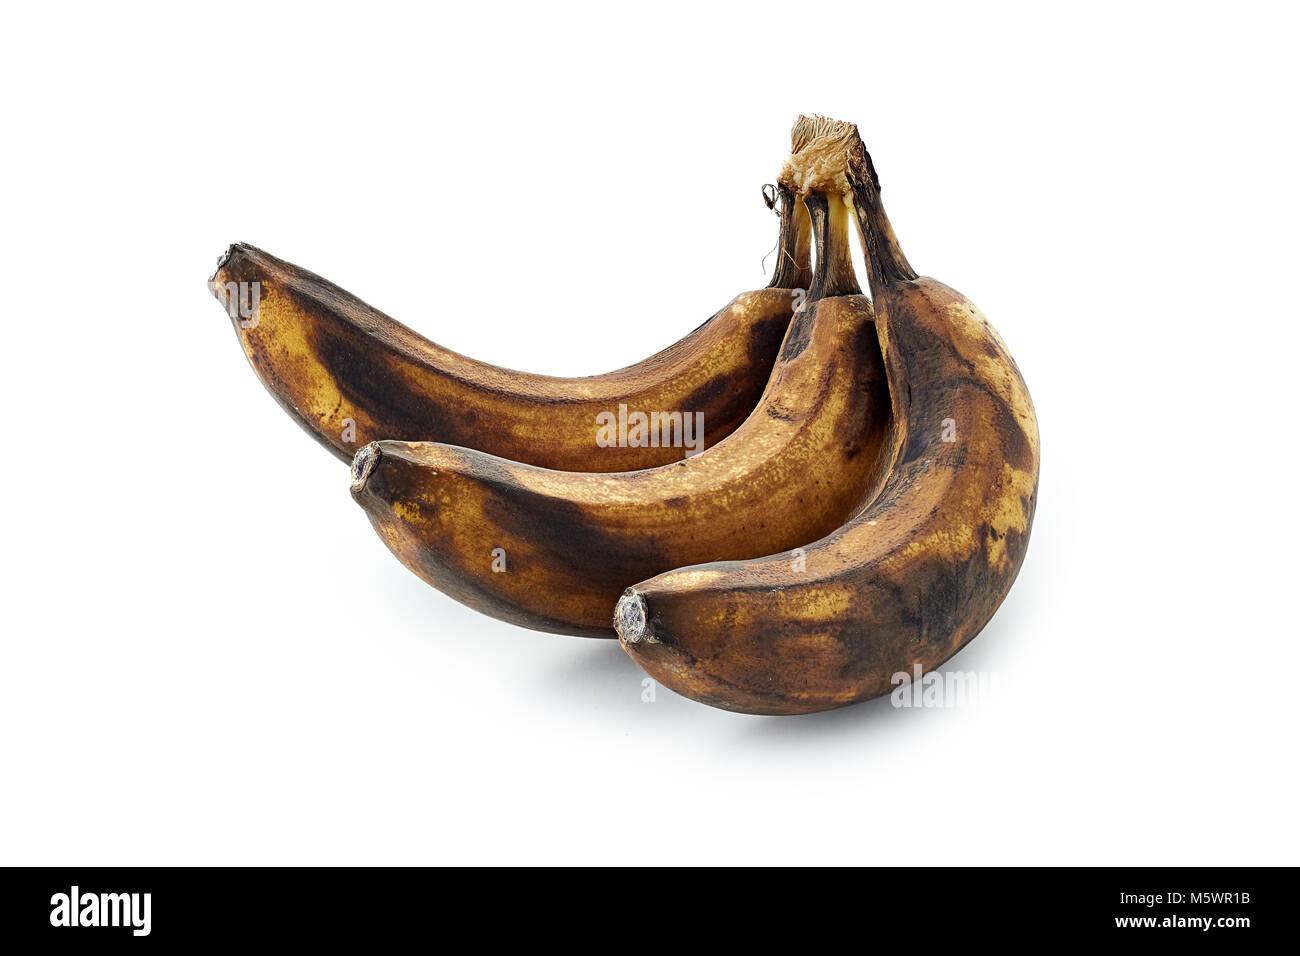 spoiled banana isolated on white background - Stock Image